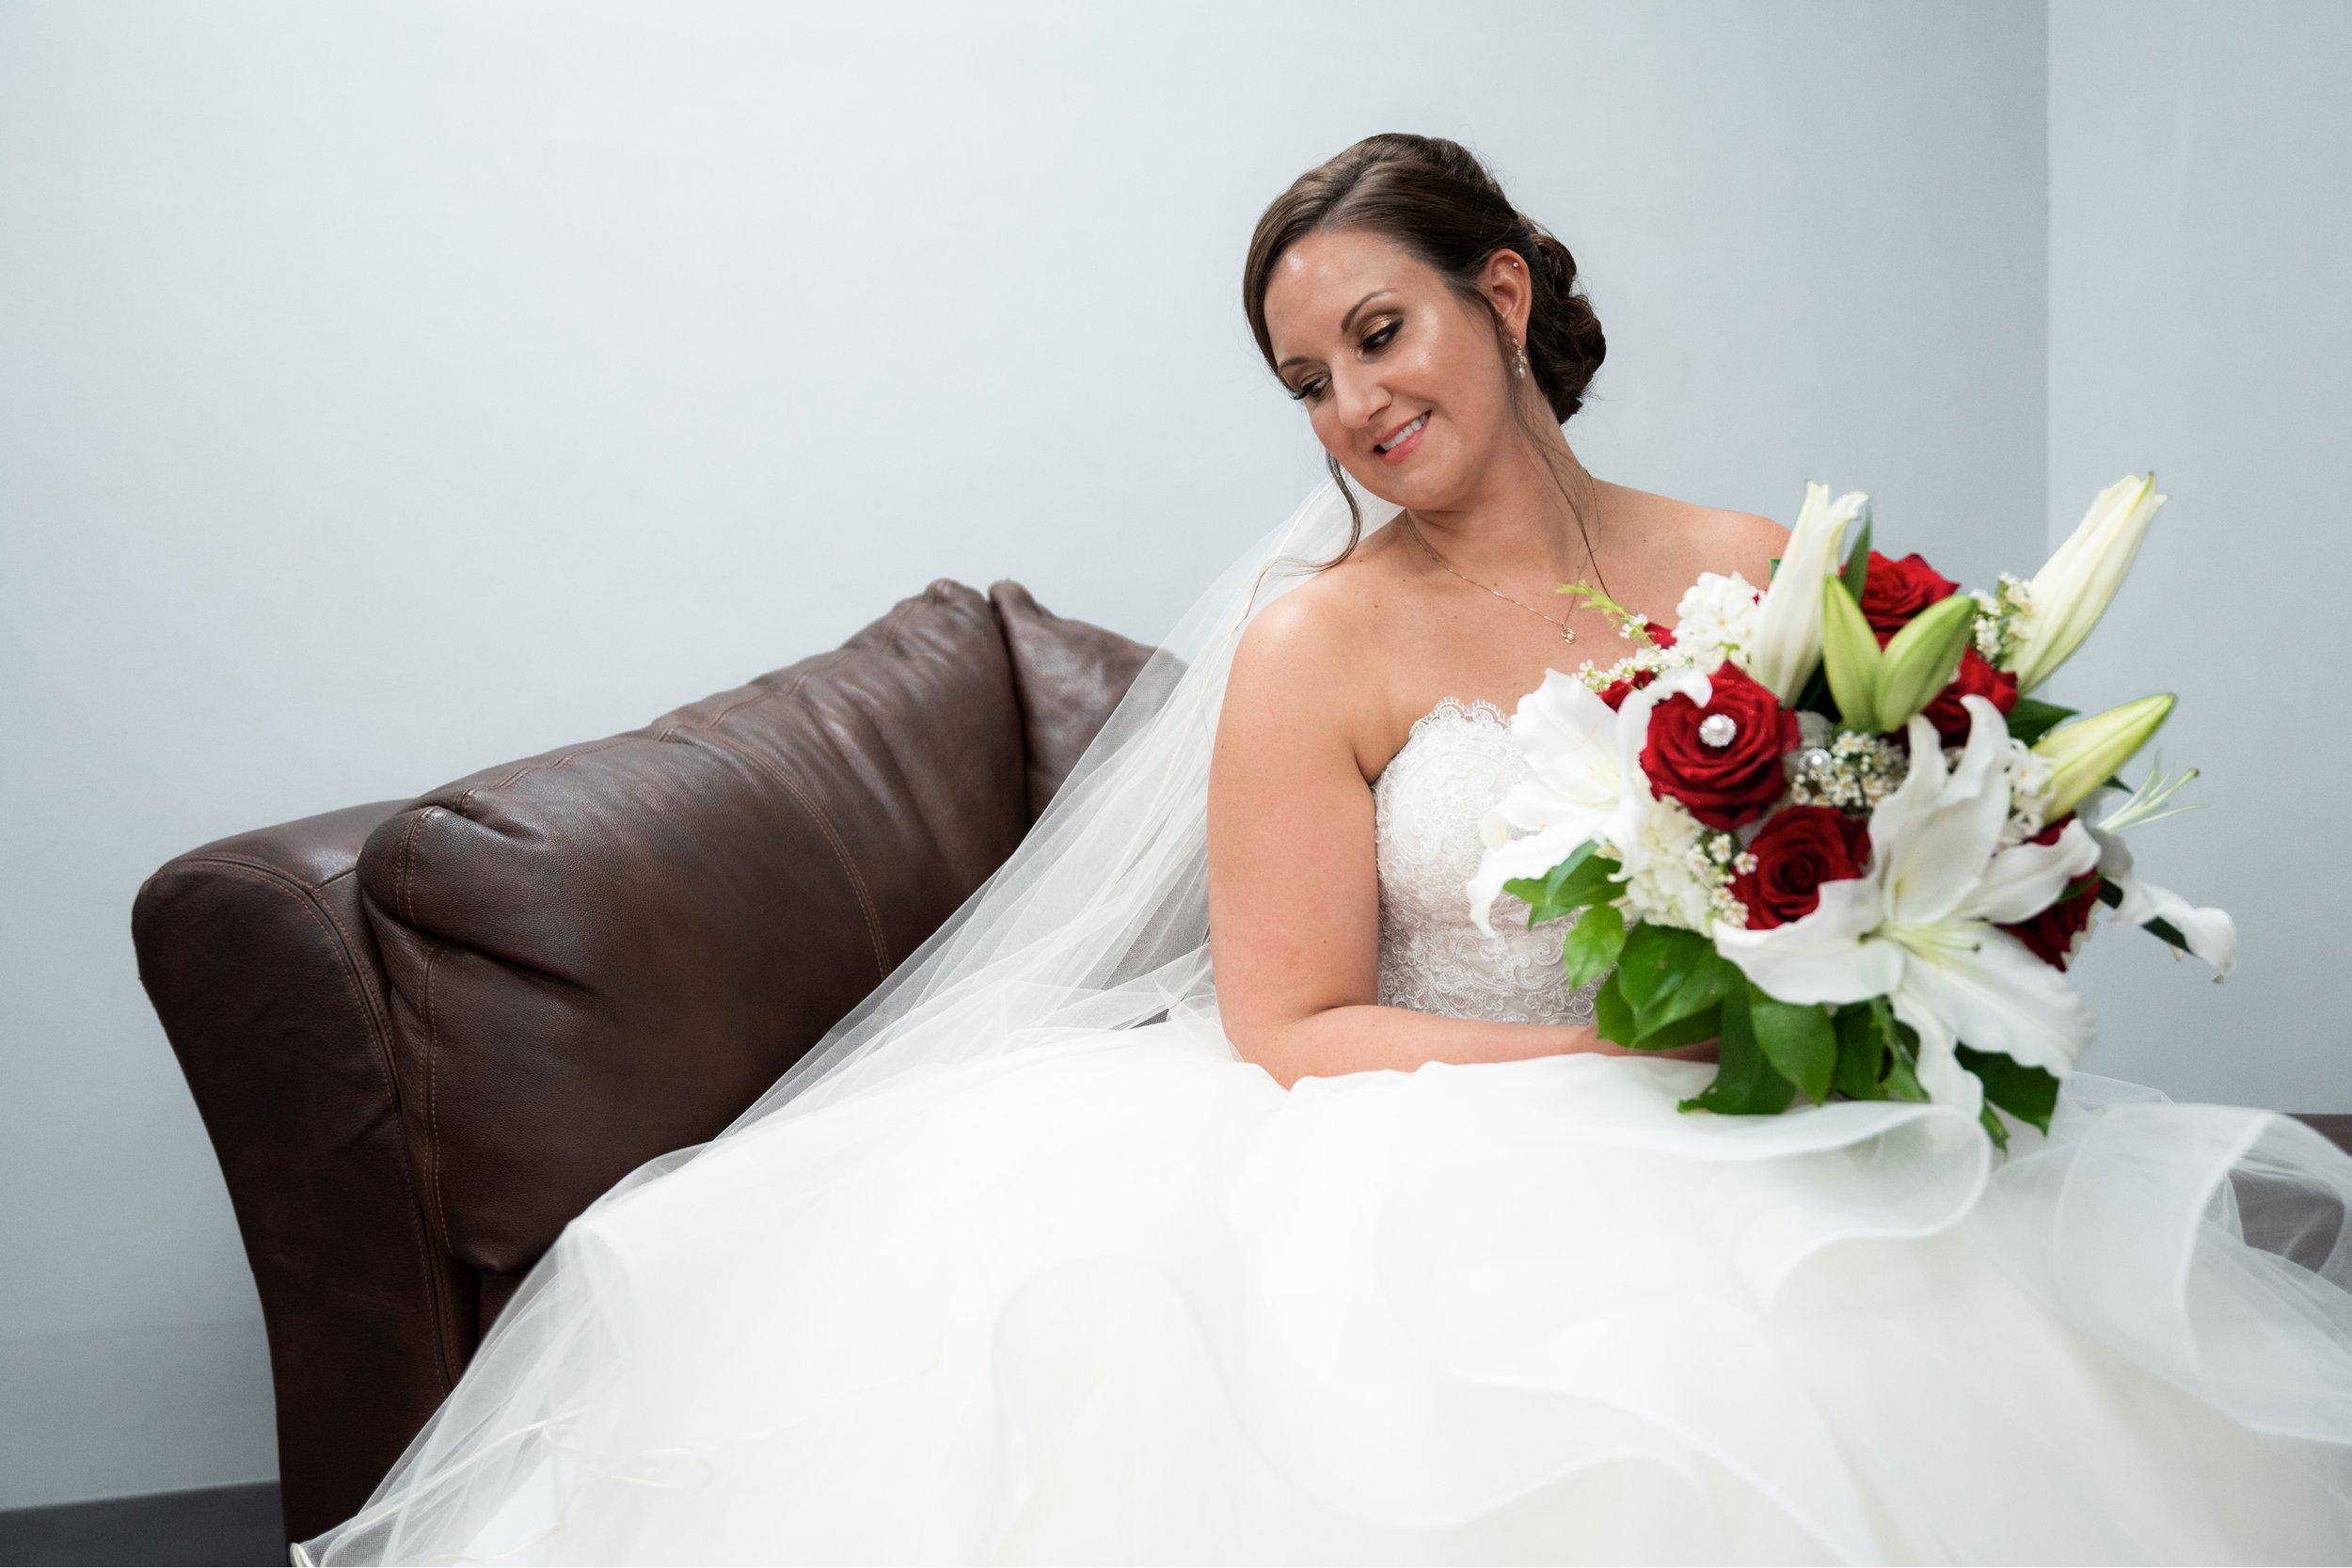 High Vista Weddings - Asheville Wedding 2 3.jpg